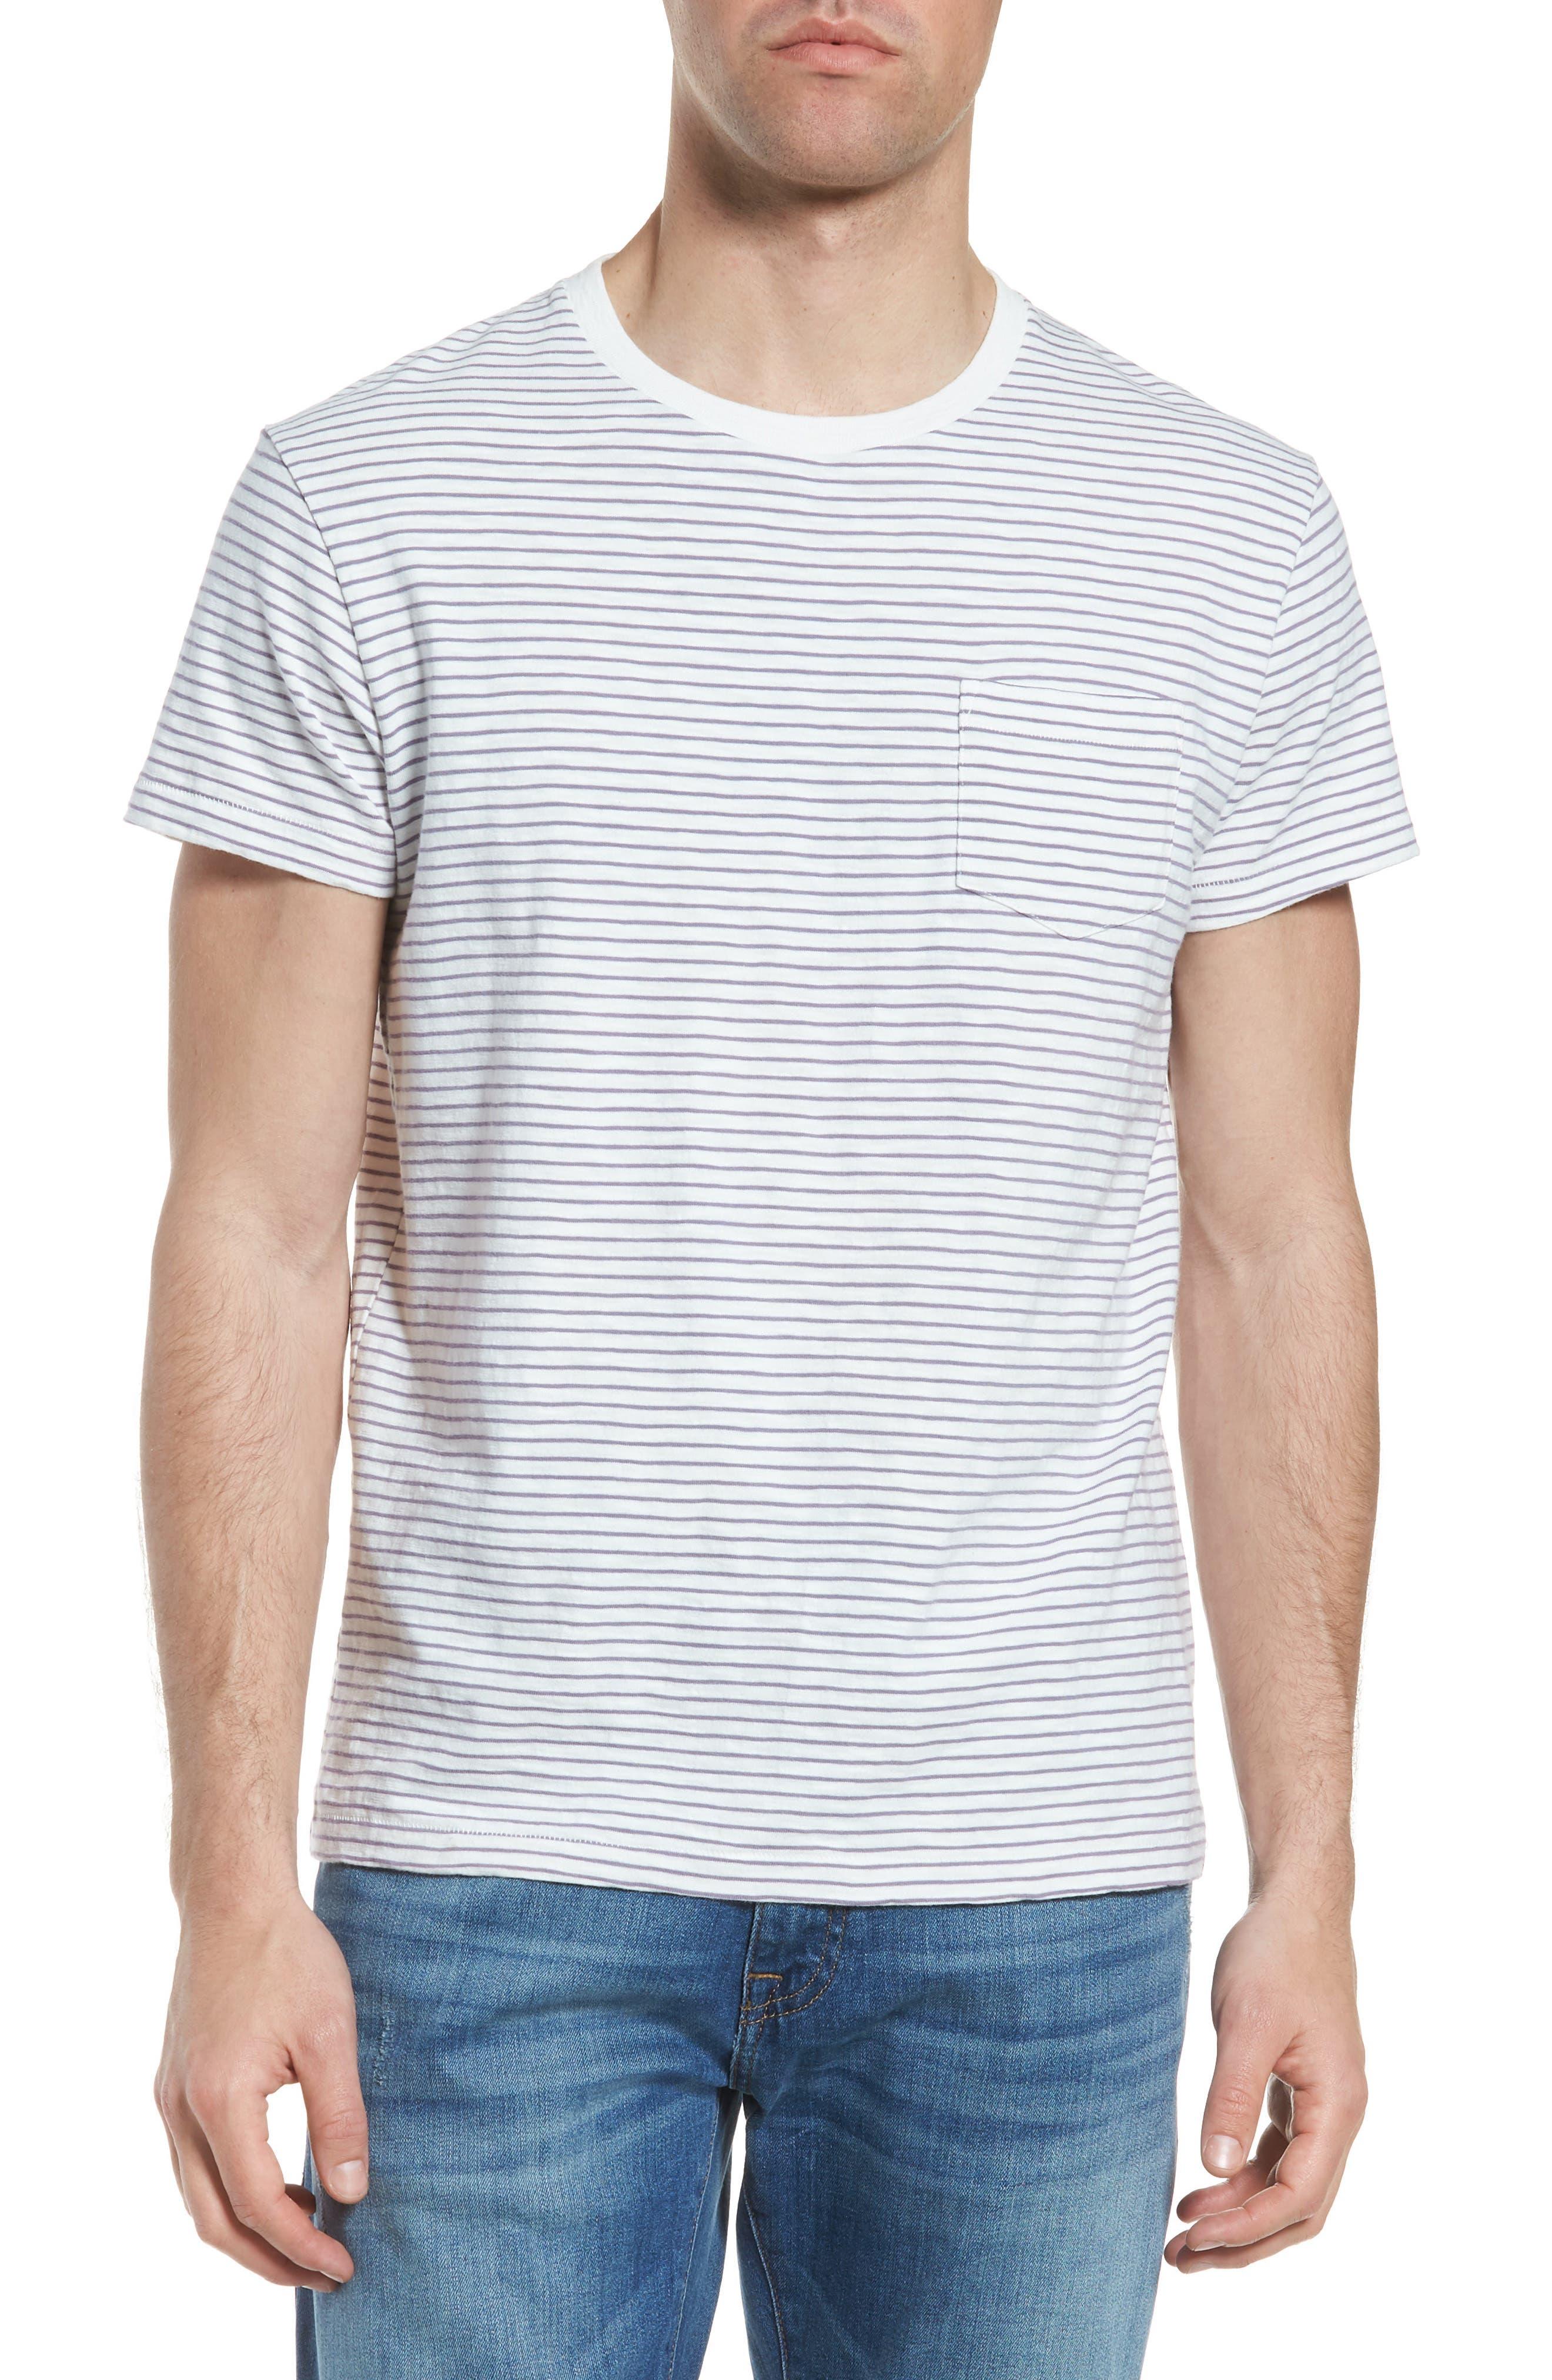 Malaga Cove Stripe T-Shirt,                             Main thumbnail 1, color,                             Antique White